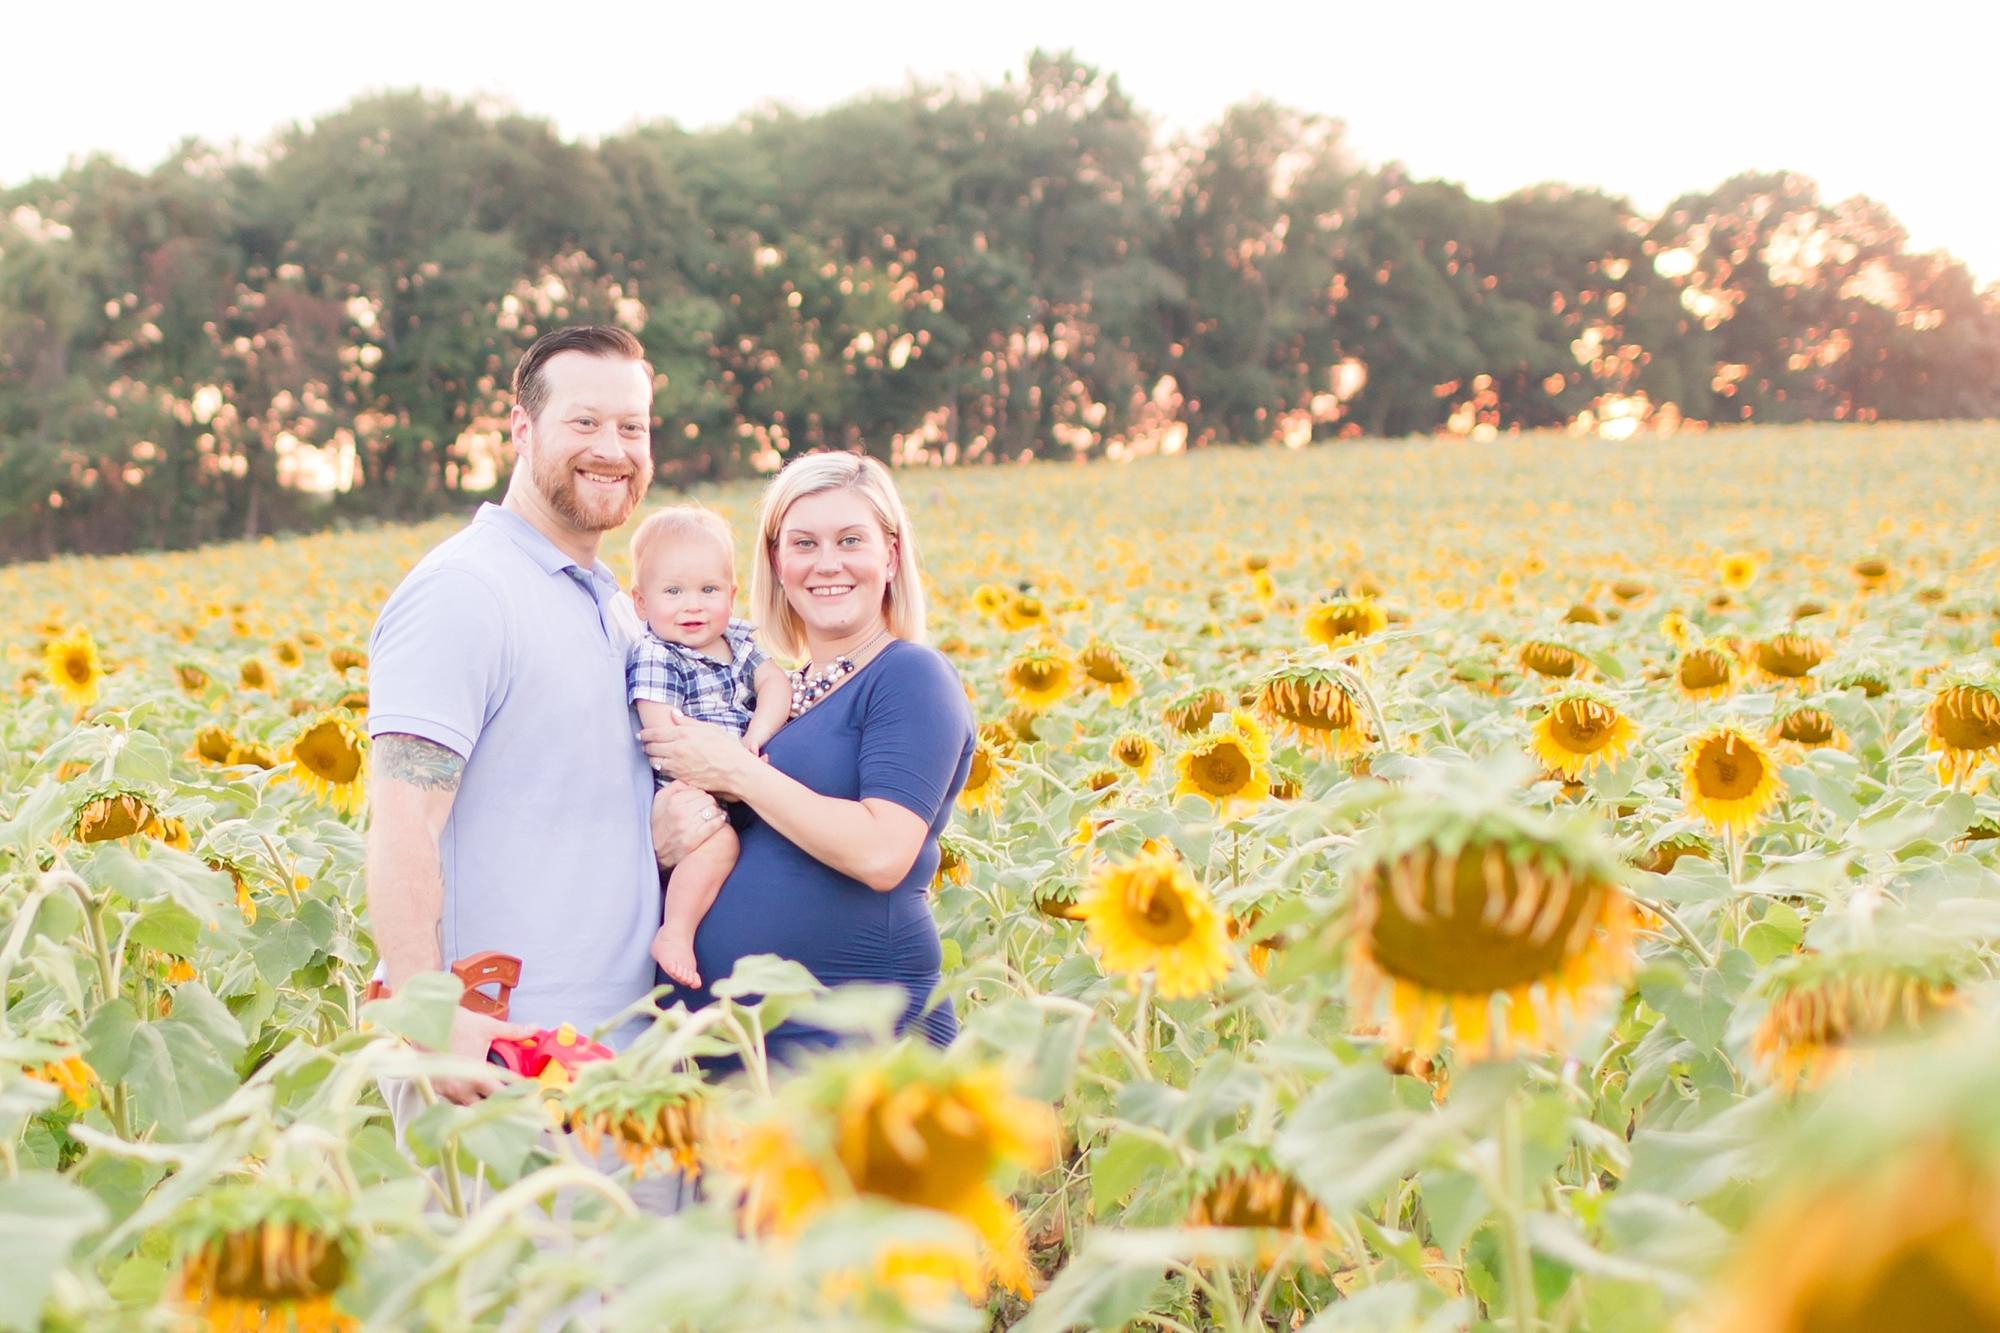 Andrews Family 2016-280_anna grace photography baltimore maryland maternity family photographer sunflower field photo.jpg